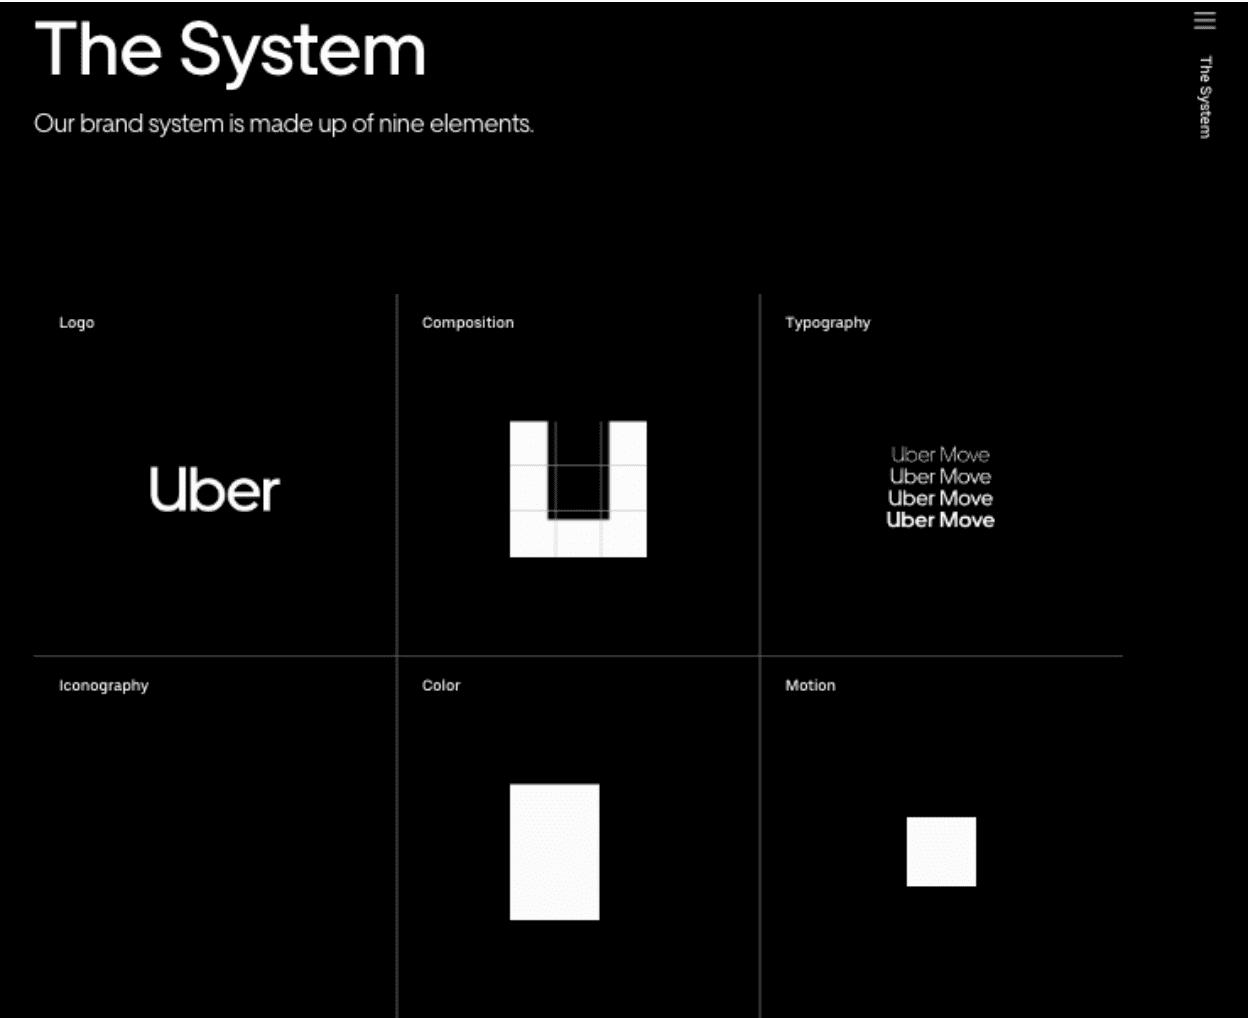 uber_screenshot